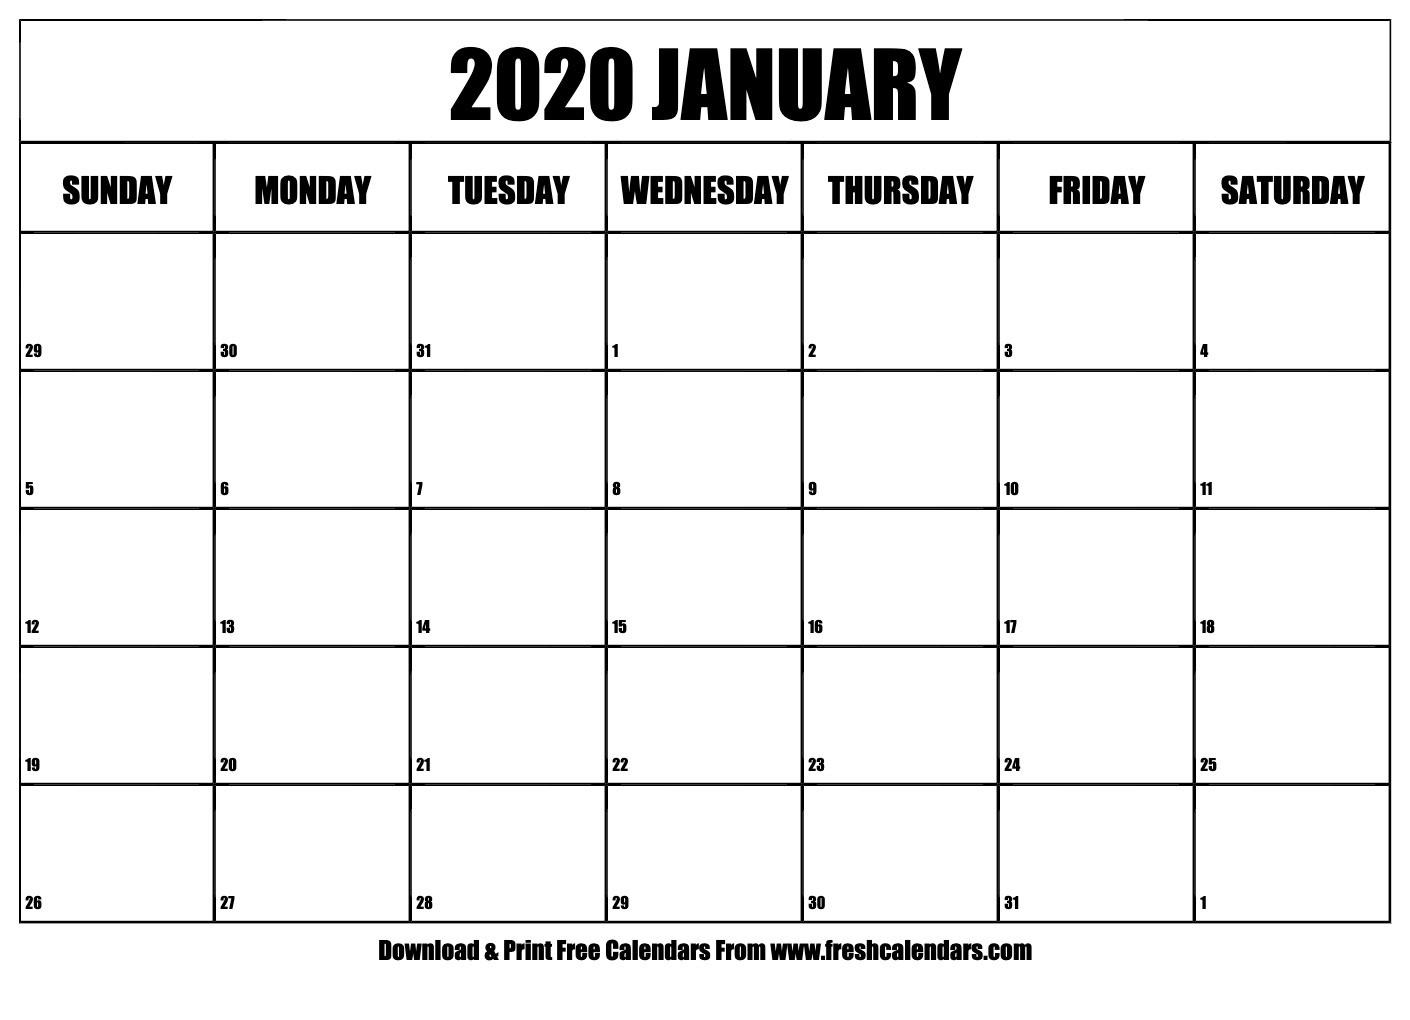 January 2020 Calendar Printable - Fresh Calendars-January 2020 Calendar Xl